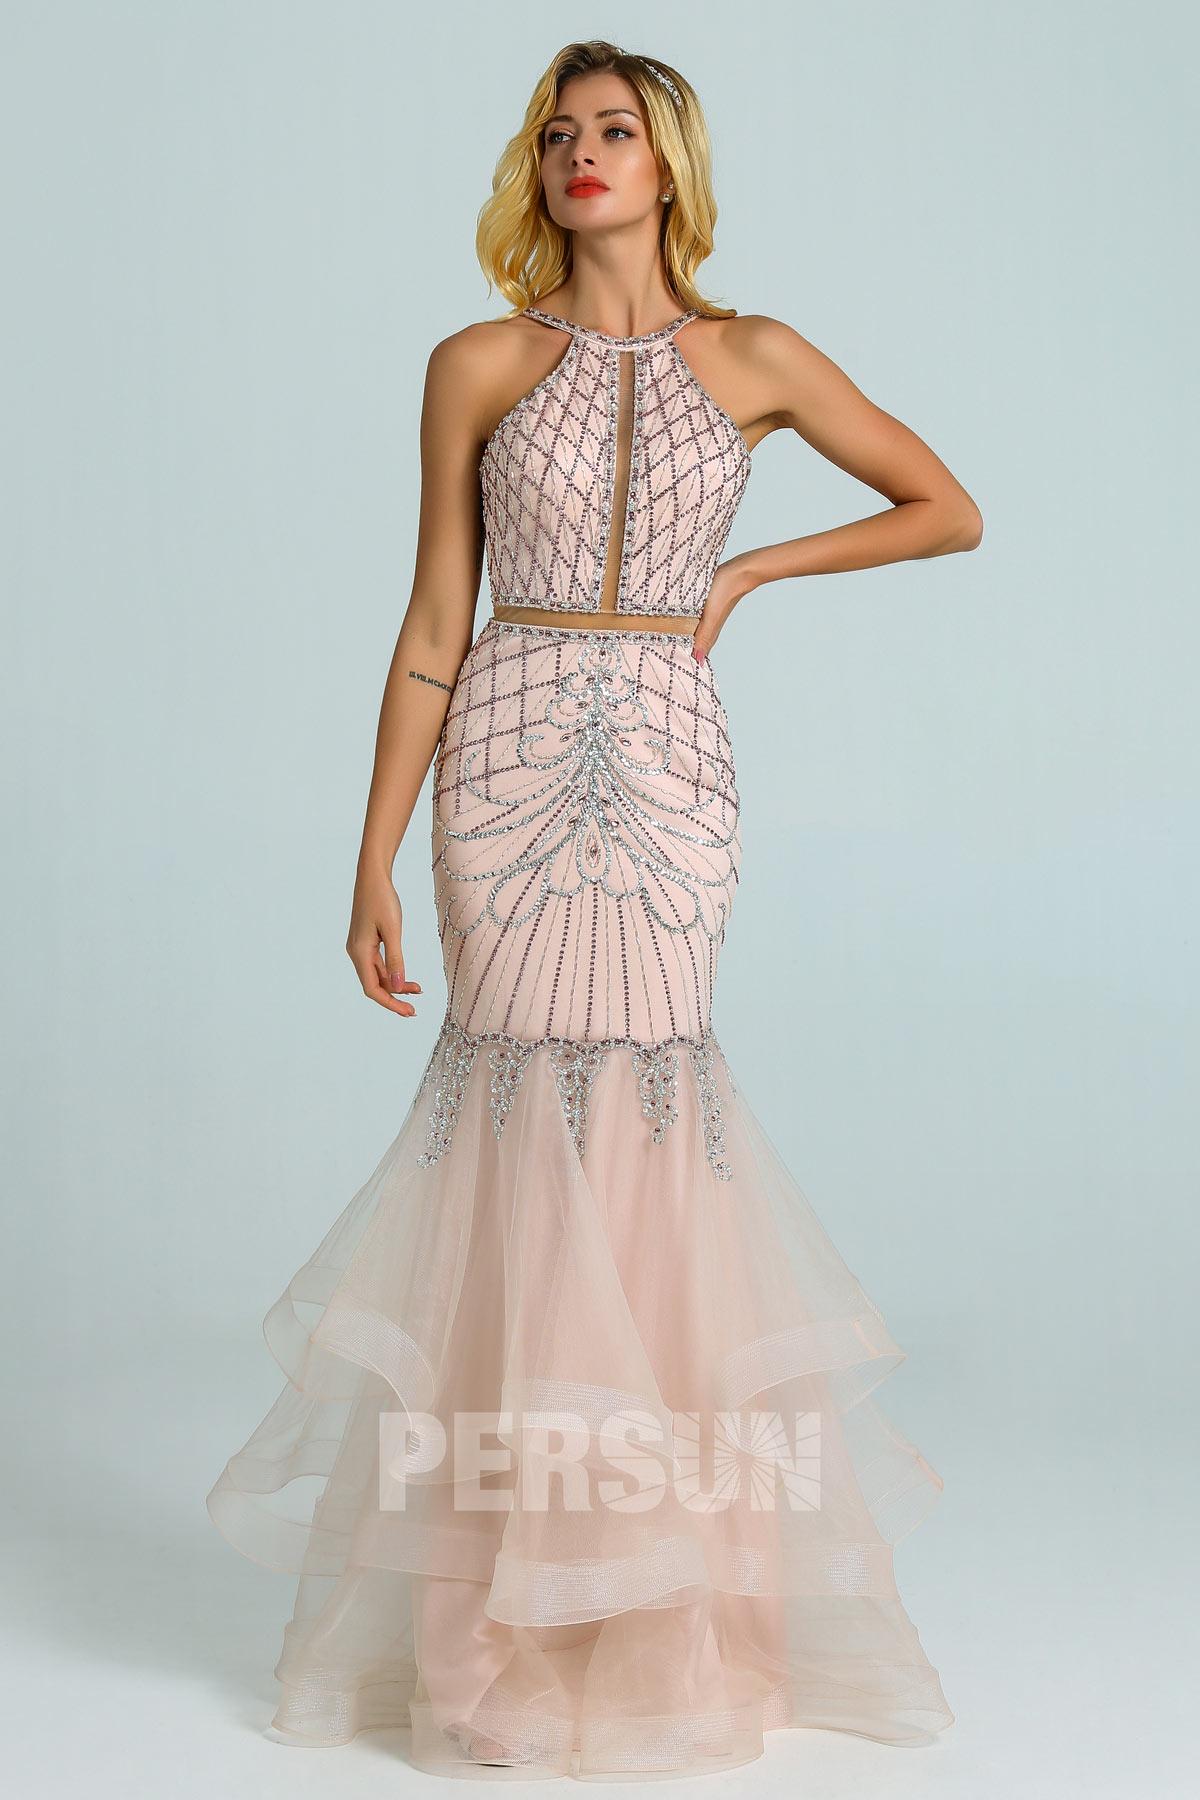 robe de mariée rose pâle vintage sirène col américain brodée de strass